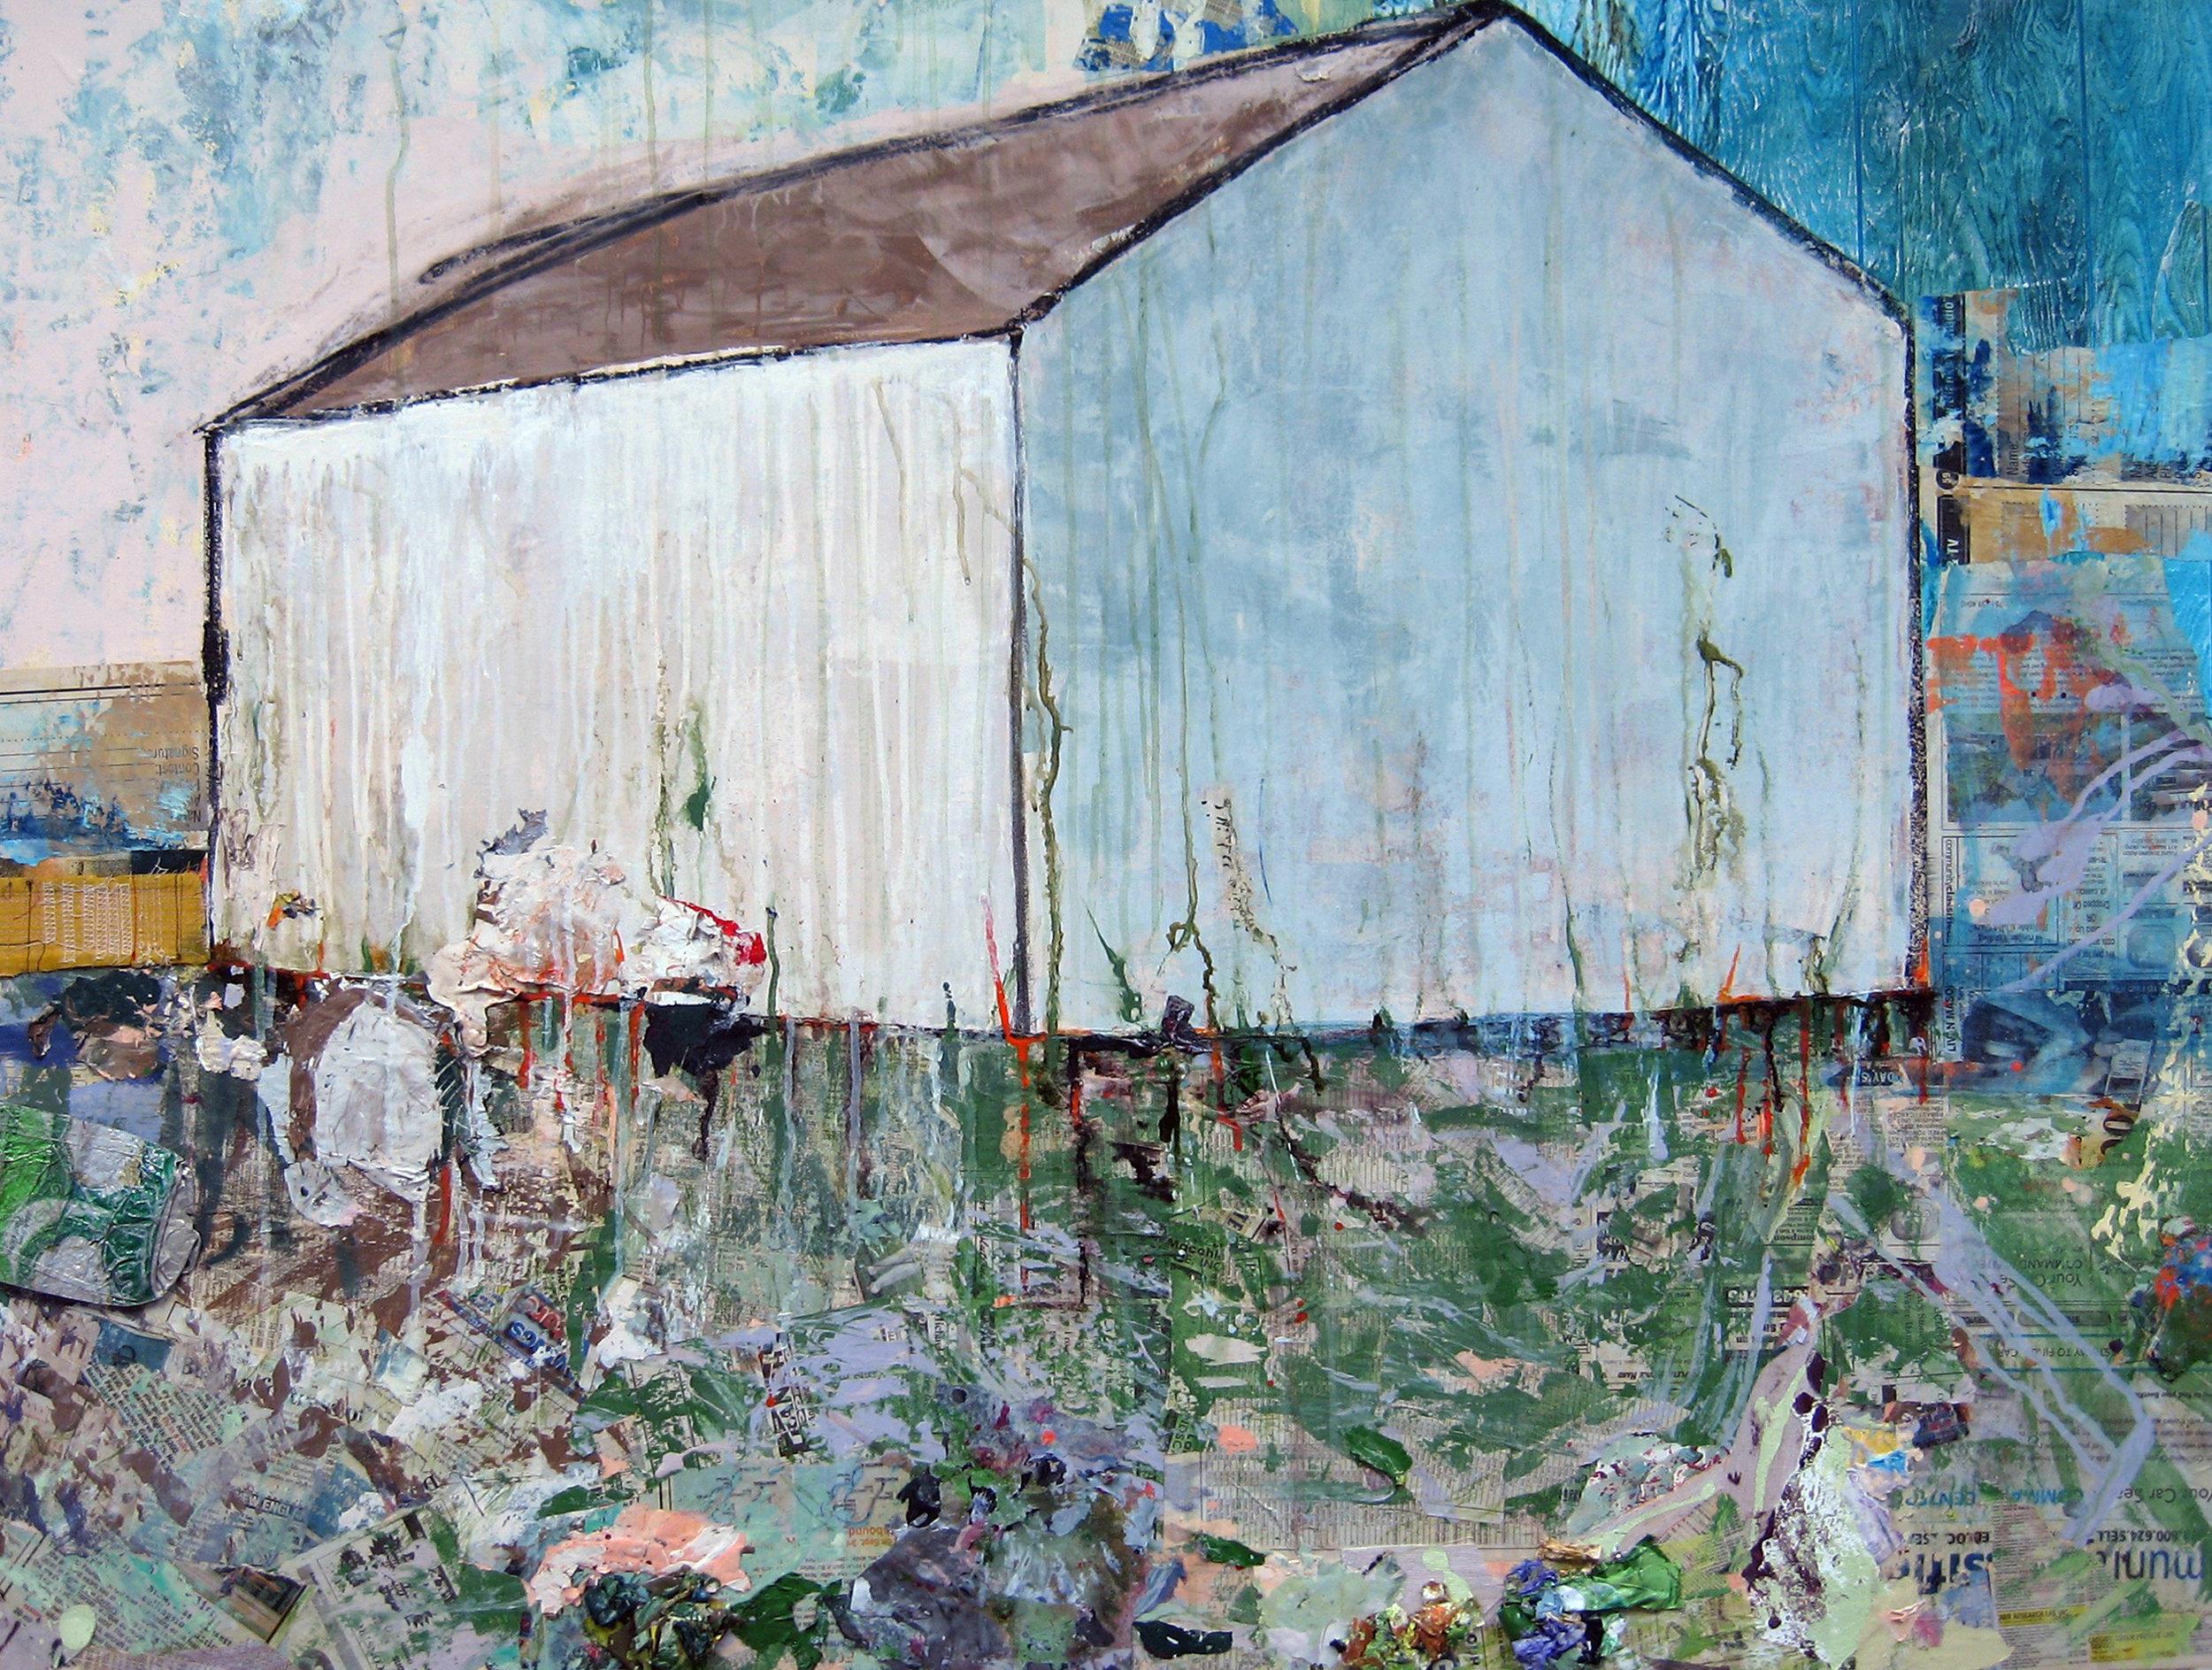 Brenda Cirioni,  Barn Series: Fortress, Mixed media painting, 36x48